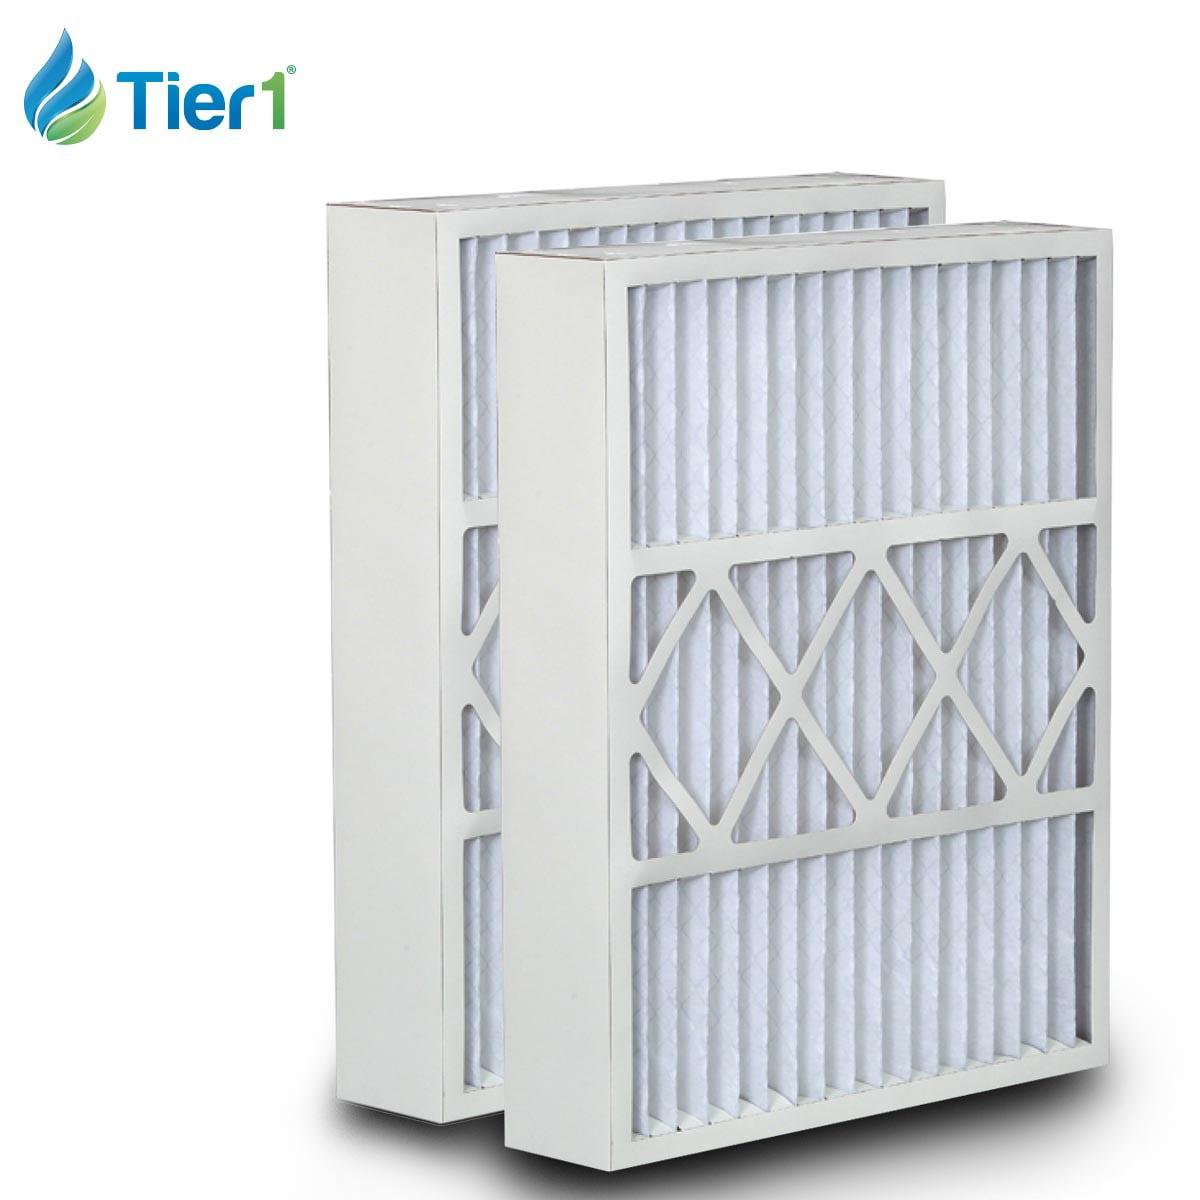 Honeywell 5-2025-11 20x25x5 Merv 11 Replacement AC Furnace Air Filter (2 Pack)